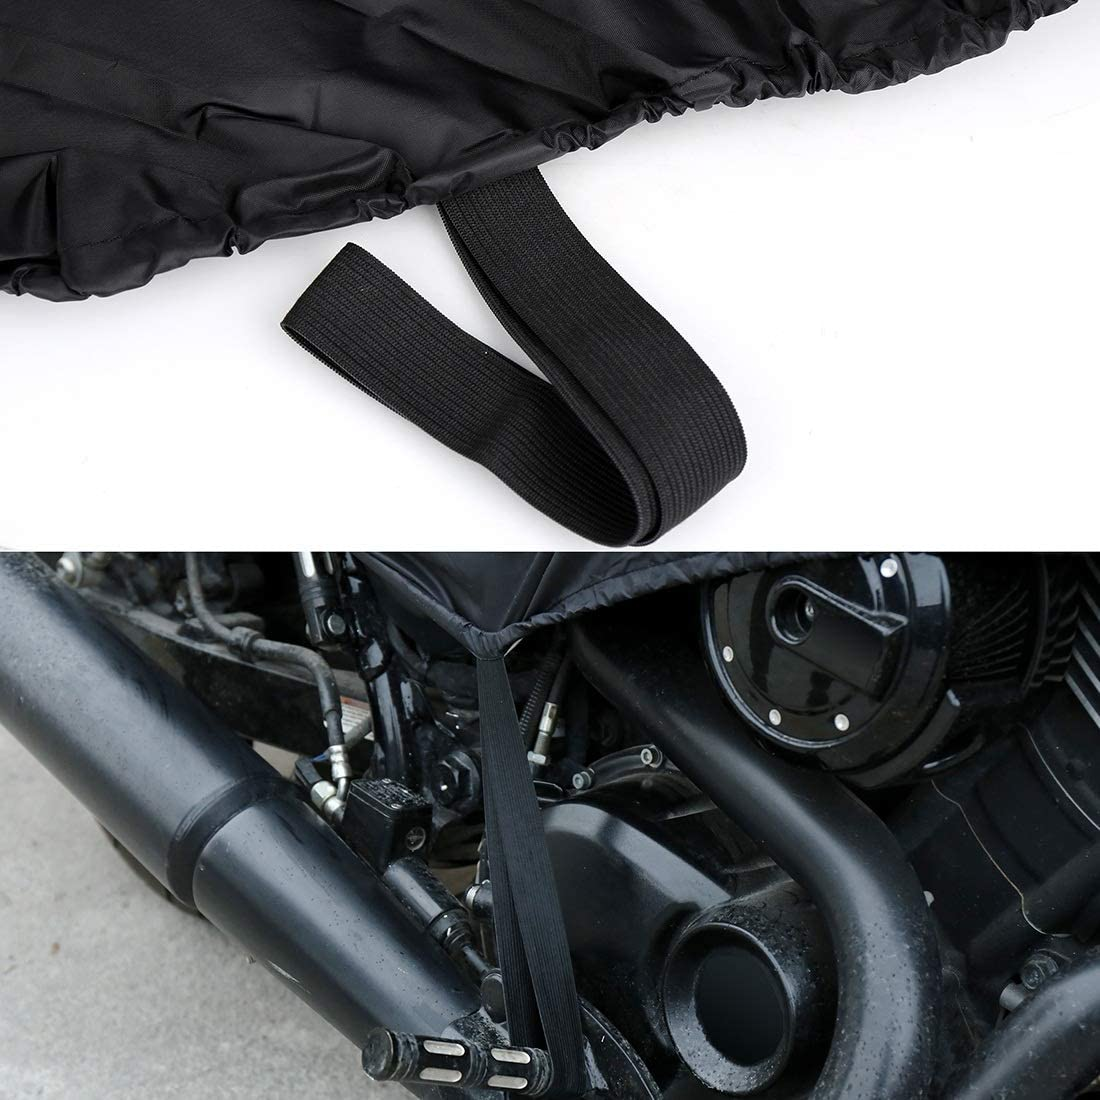 L XL SIZE Motorcycle Half Cover 210T universal Outdoor Waterproof Dustproof Rain Dust UV Protector Motorcycle Bike Color : L